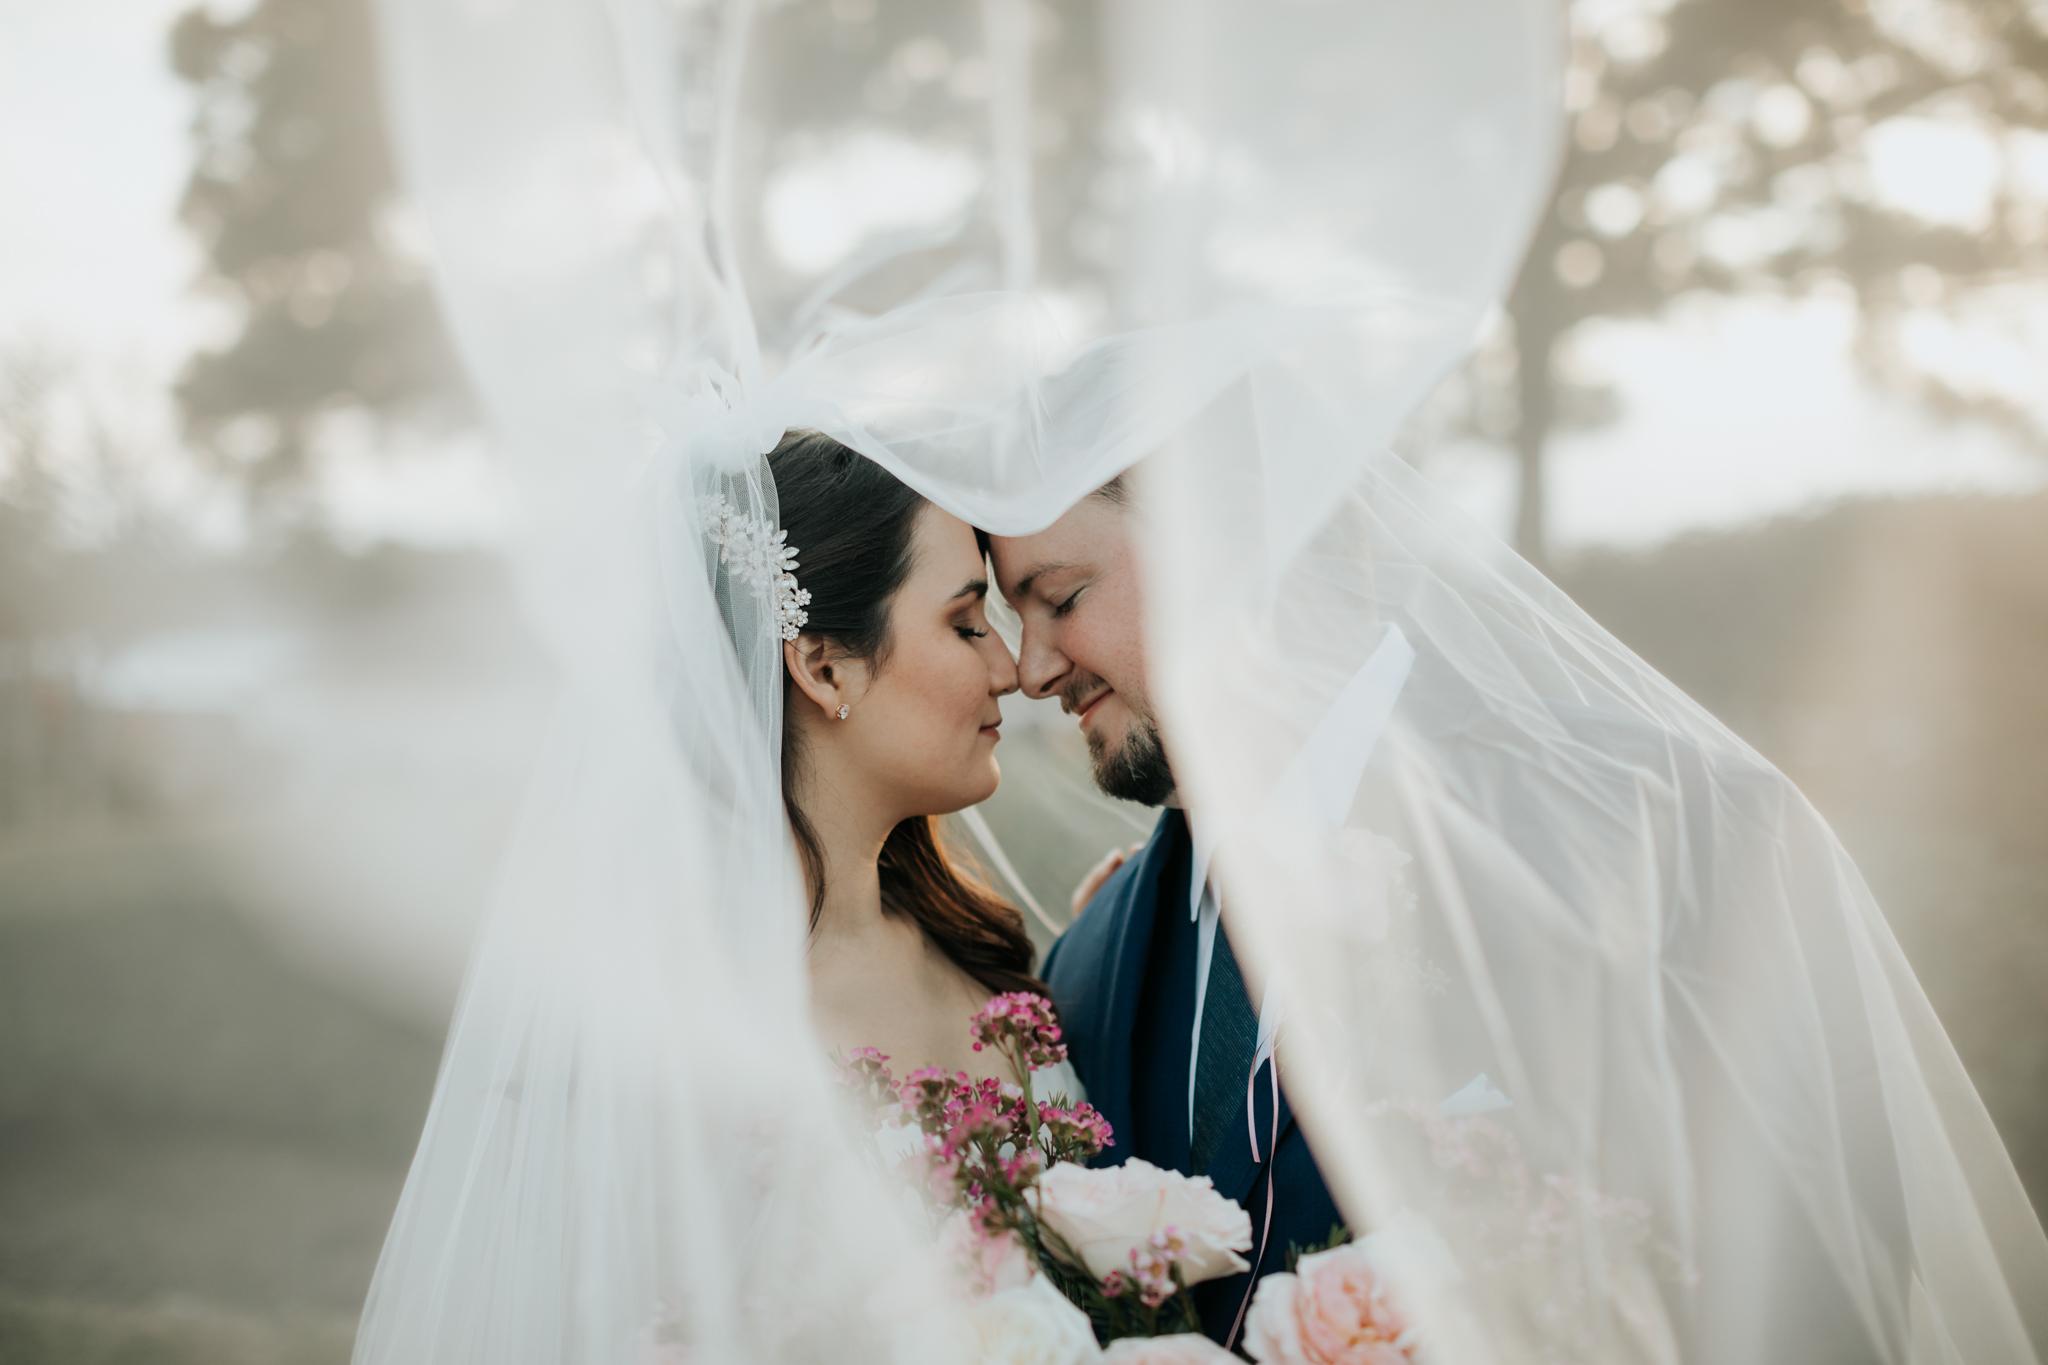 Leah Nicole Photography - Houston Wedding Photographer-Lake Conroe Wedding- Houston Wedding Photographer-37.jpg